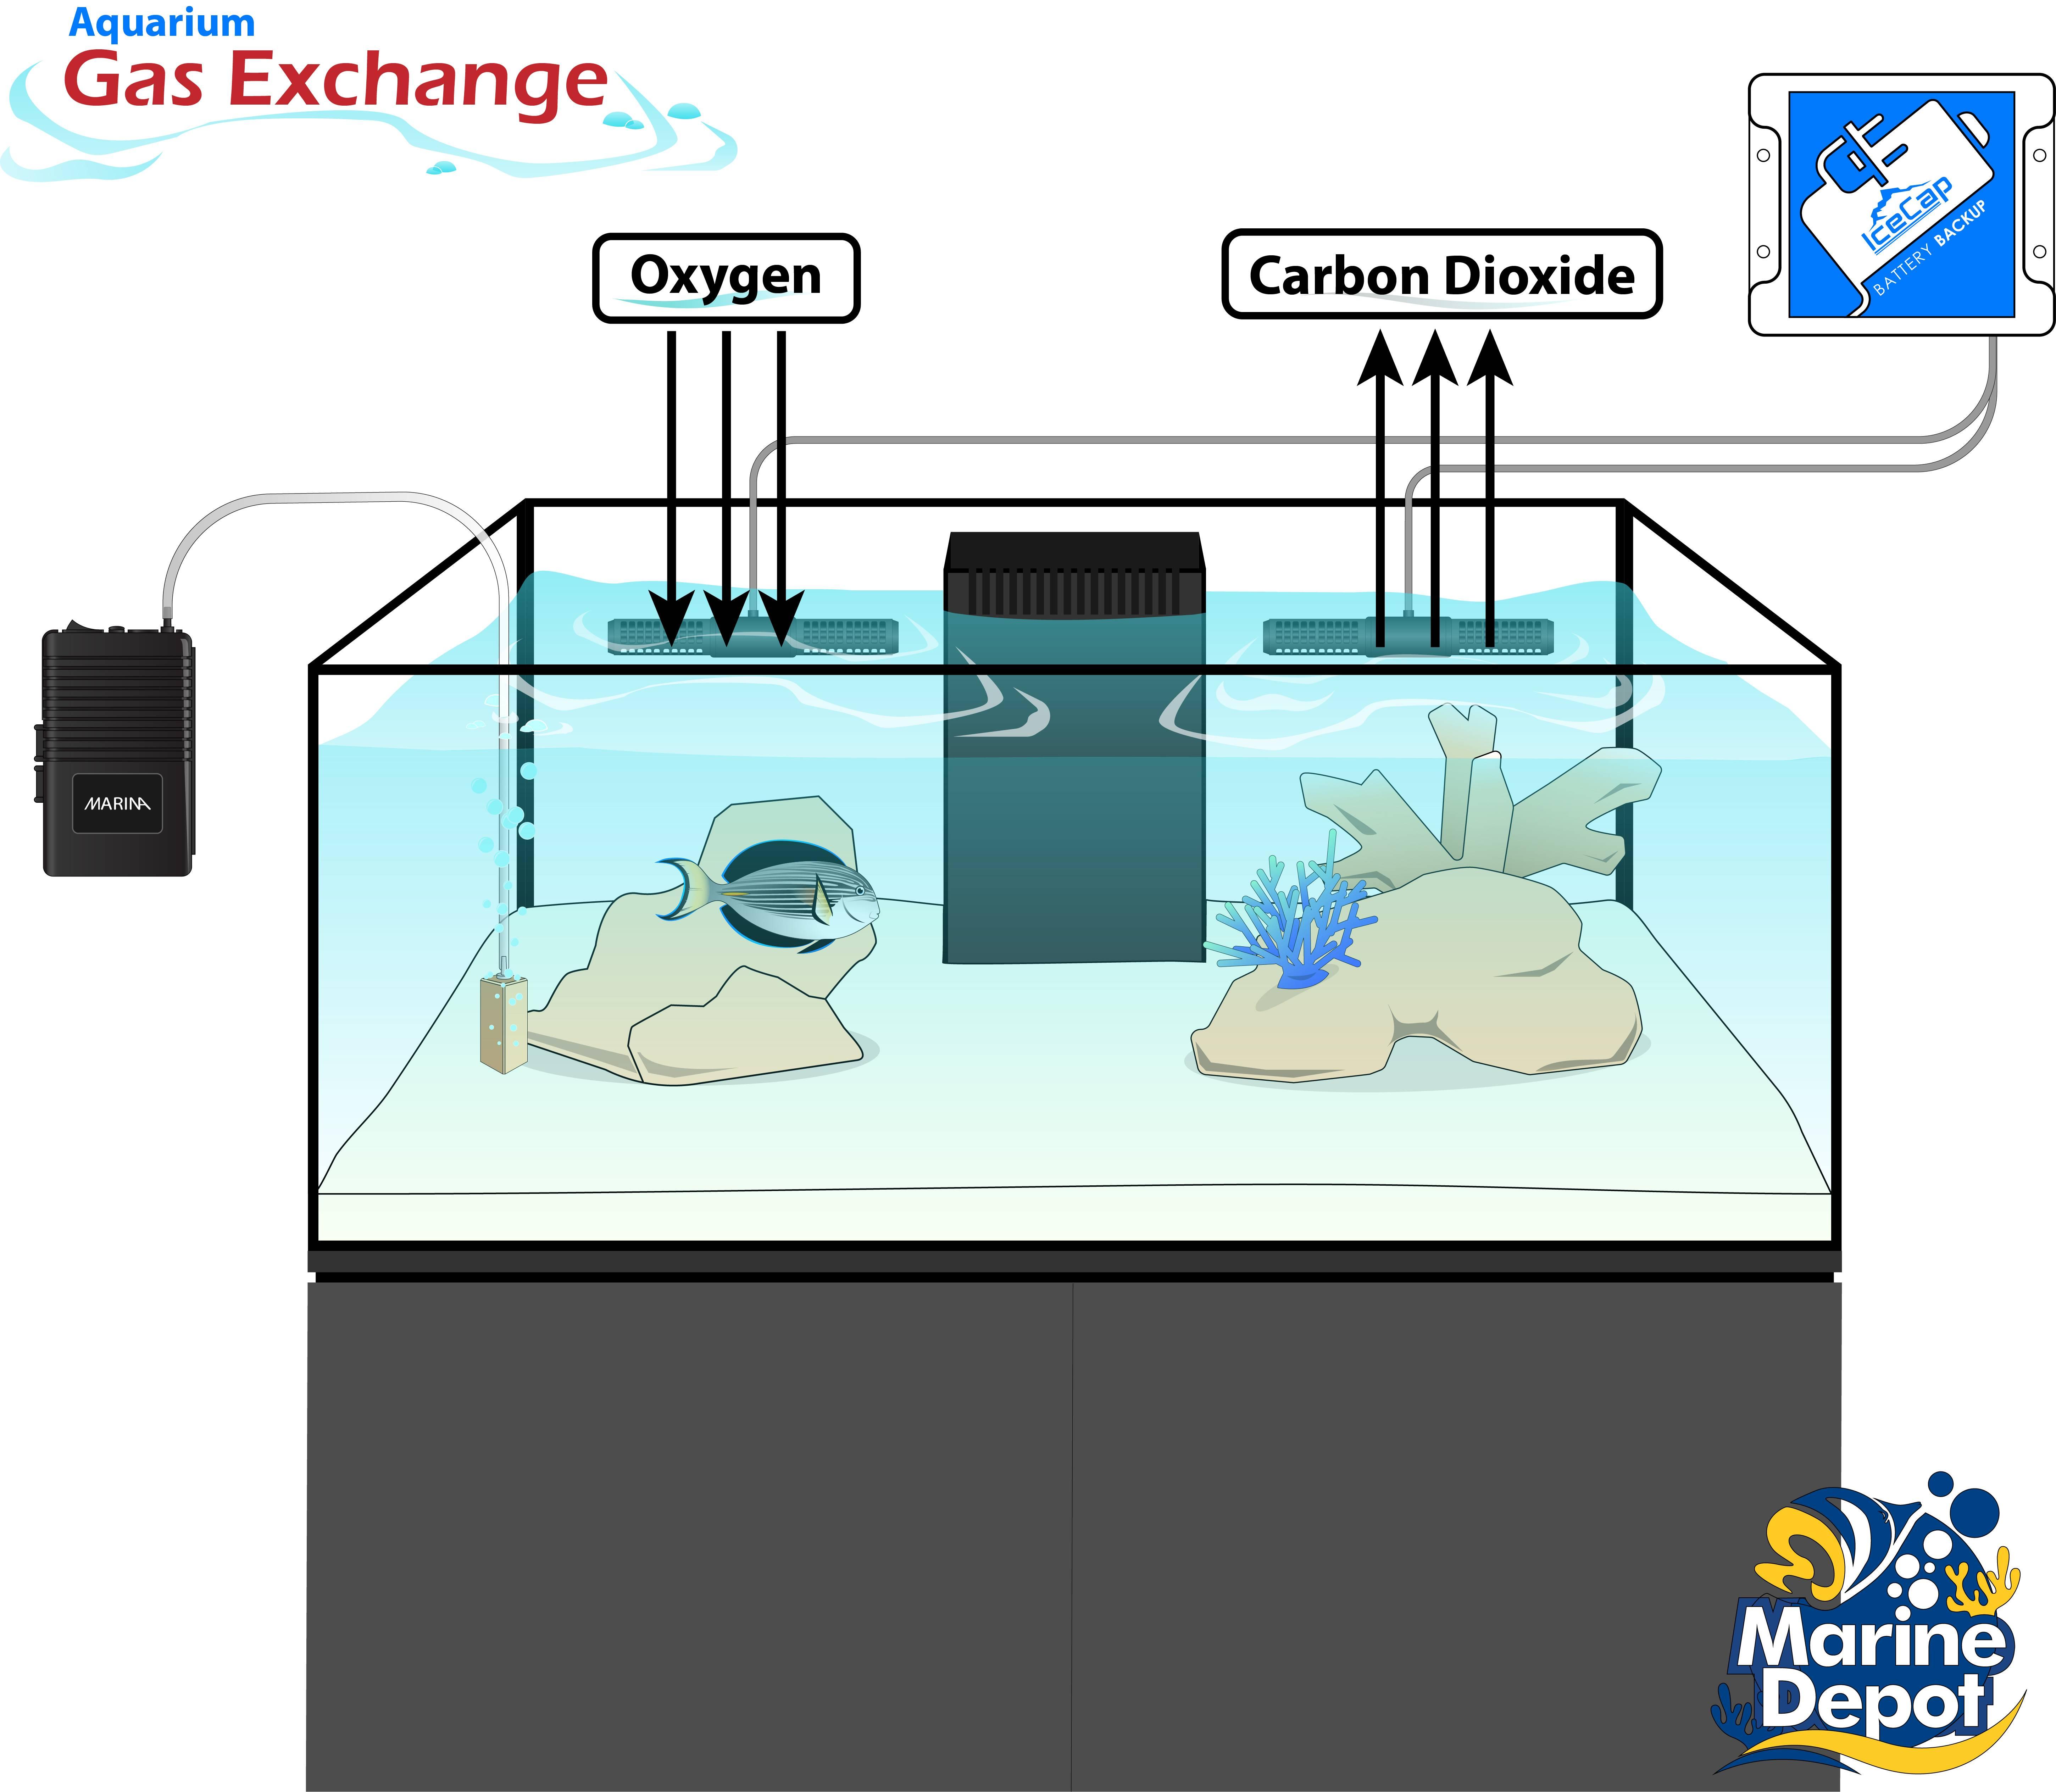 aquarium gas exchange and emergency plan back up battery and air pump setup diagram